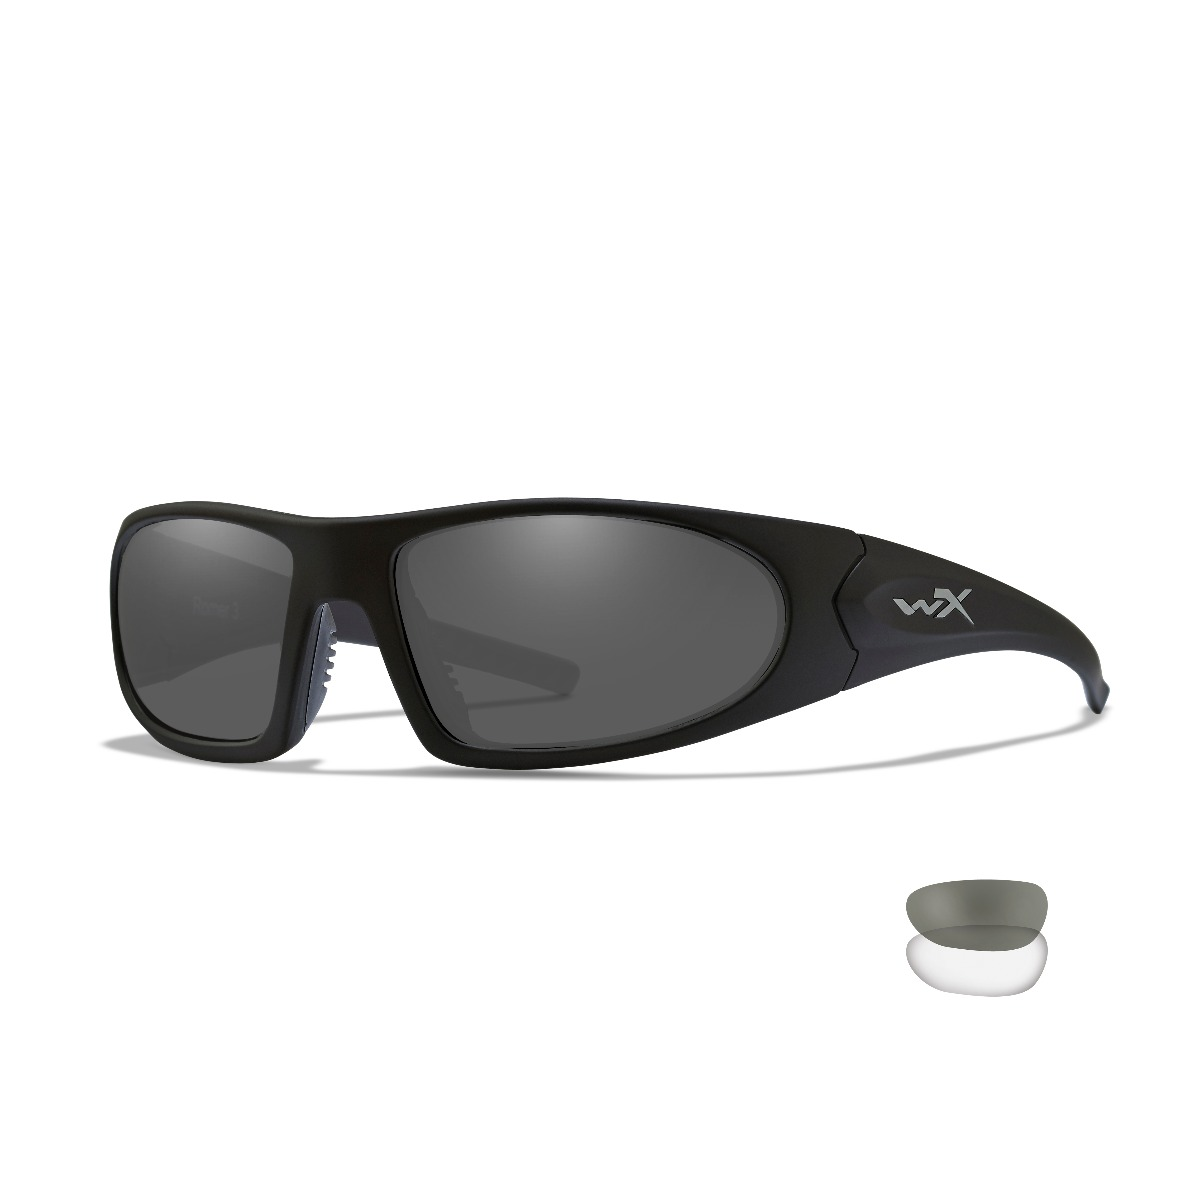 WILEY X Romer 3 Sunglasses - Smoke Grey/clear Lens - Matte Black Frame